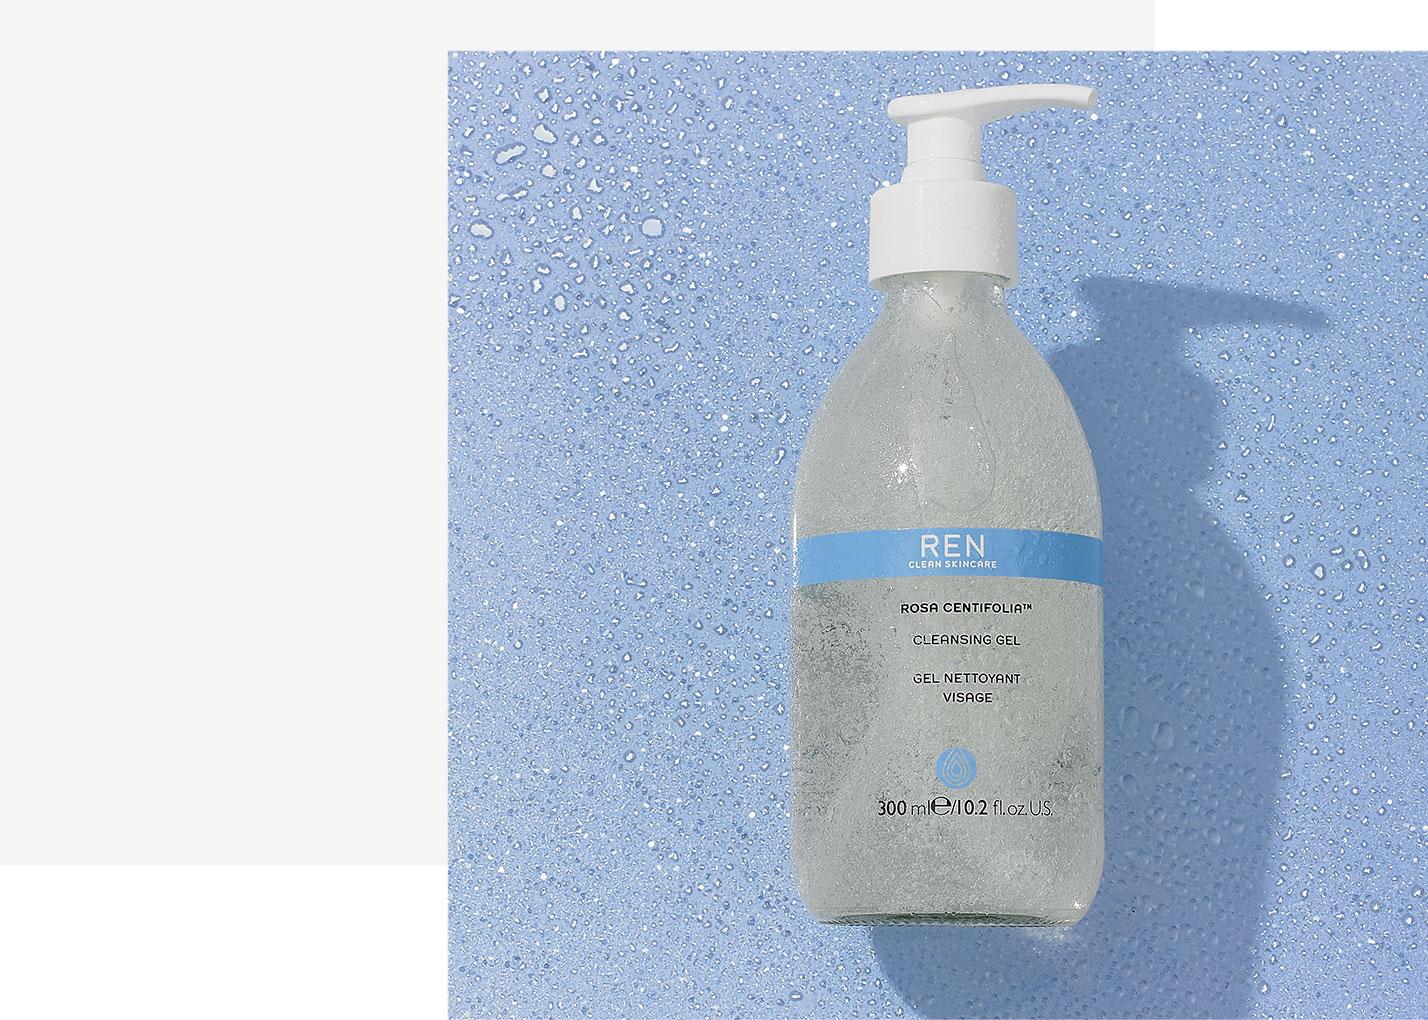 The refillable future of skincare.